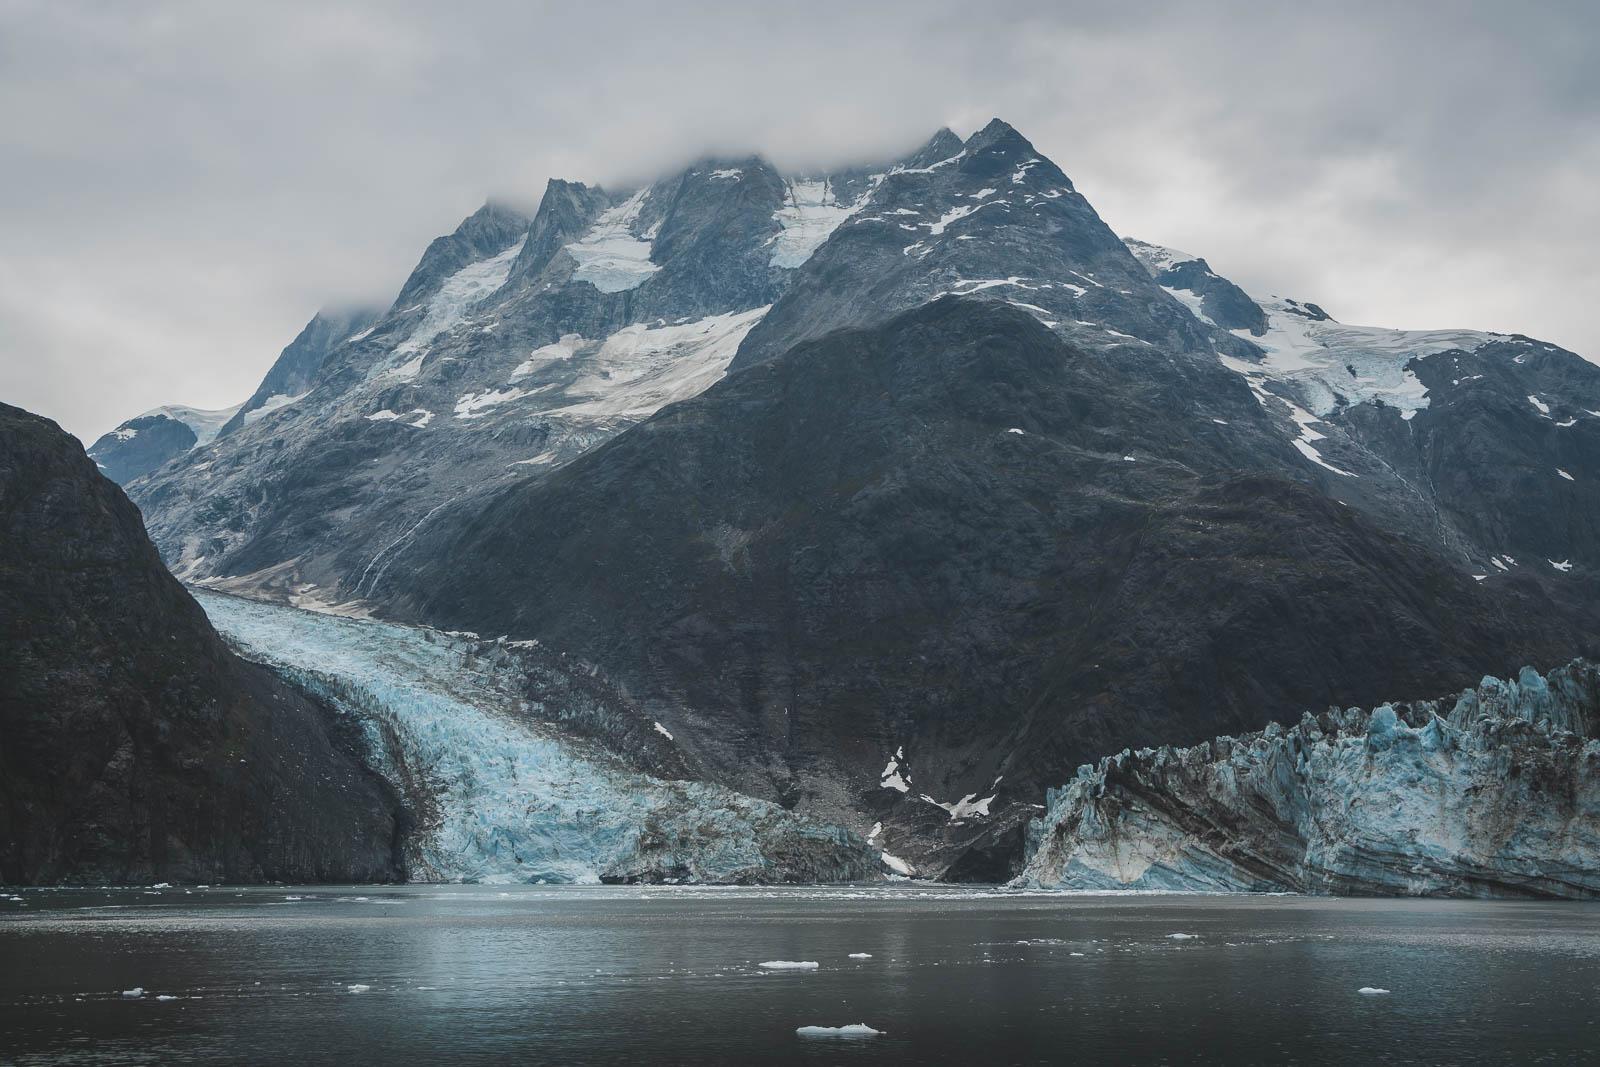 Prince William sound in Alaska